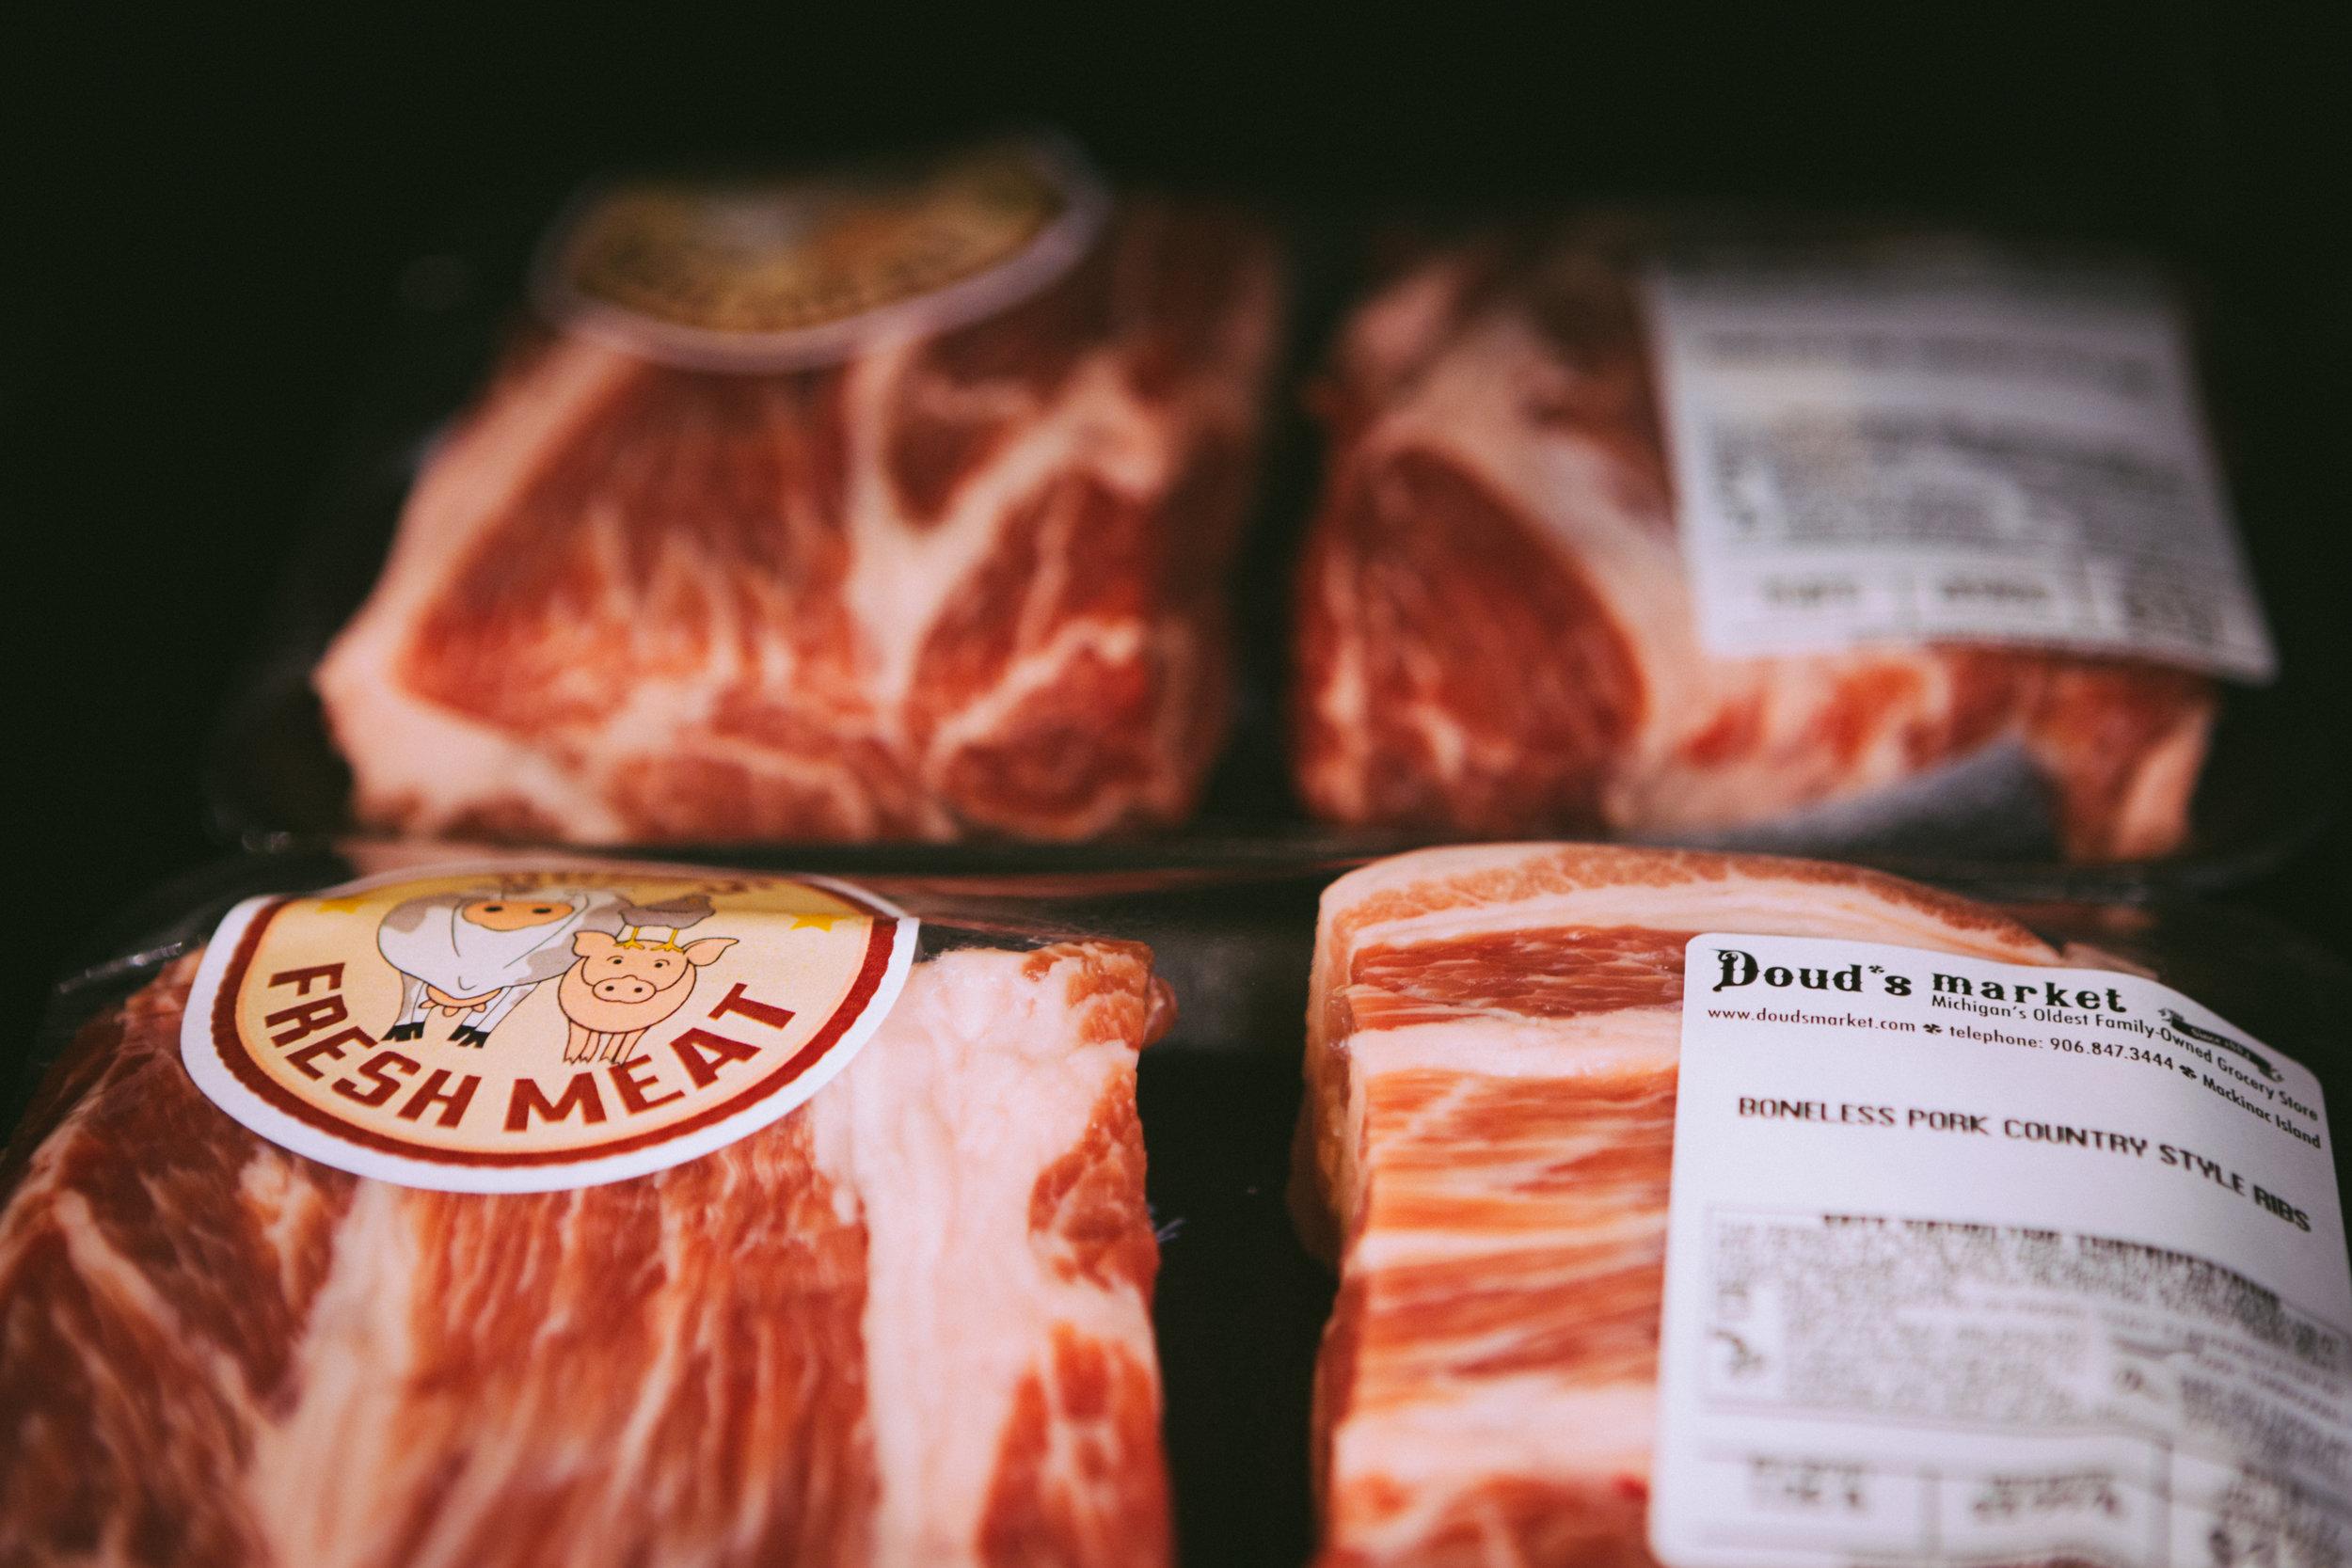 Fresh Meat Steak Chicken Beef Meat Market